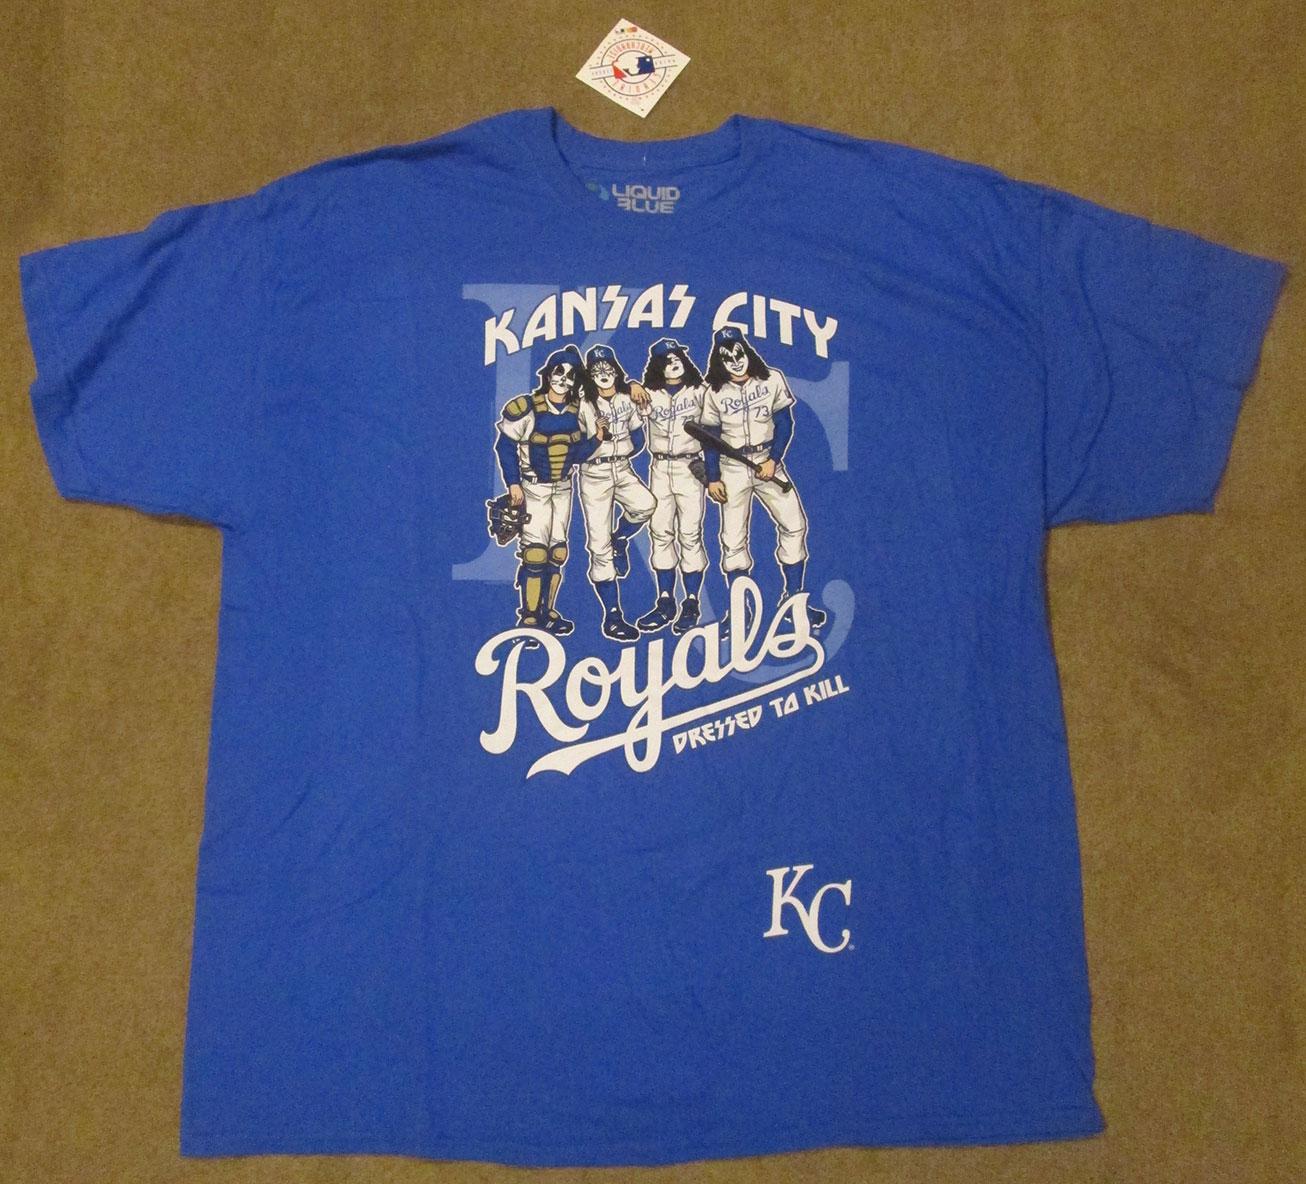 3cc90df6 Men's Kansas City Royals KISS Dressed to Kill Baseball T-shirt - 2XL